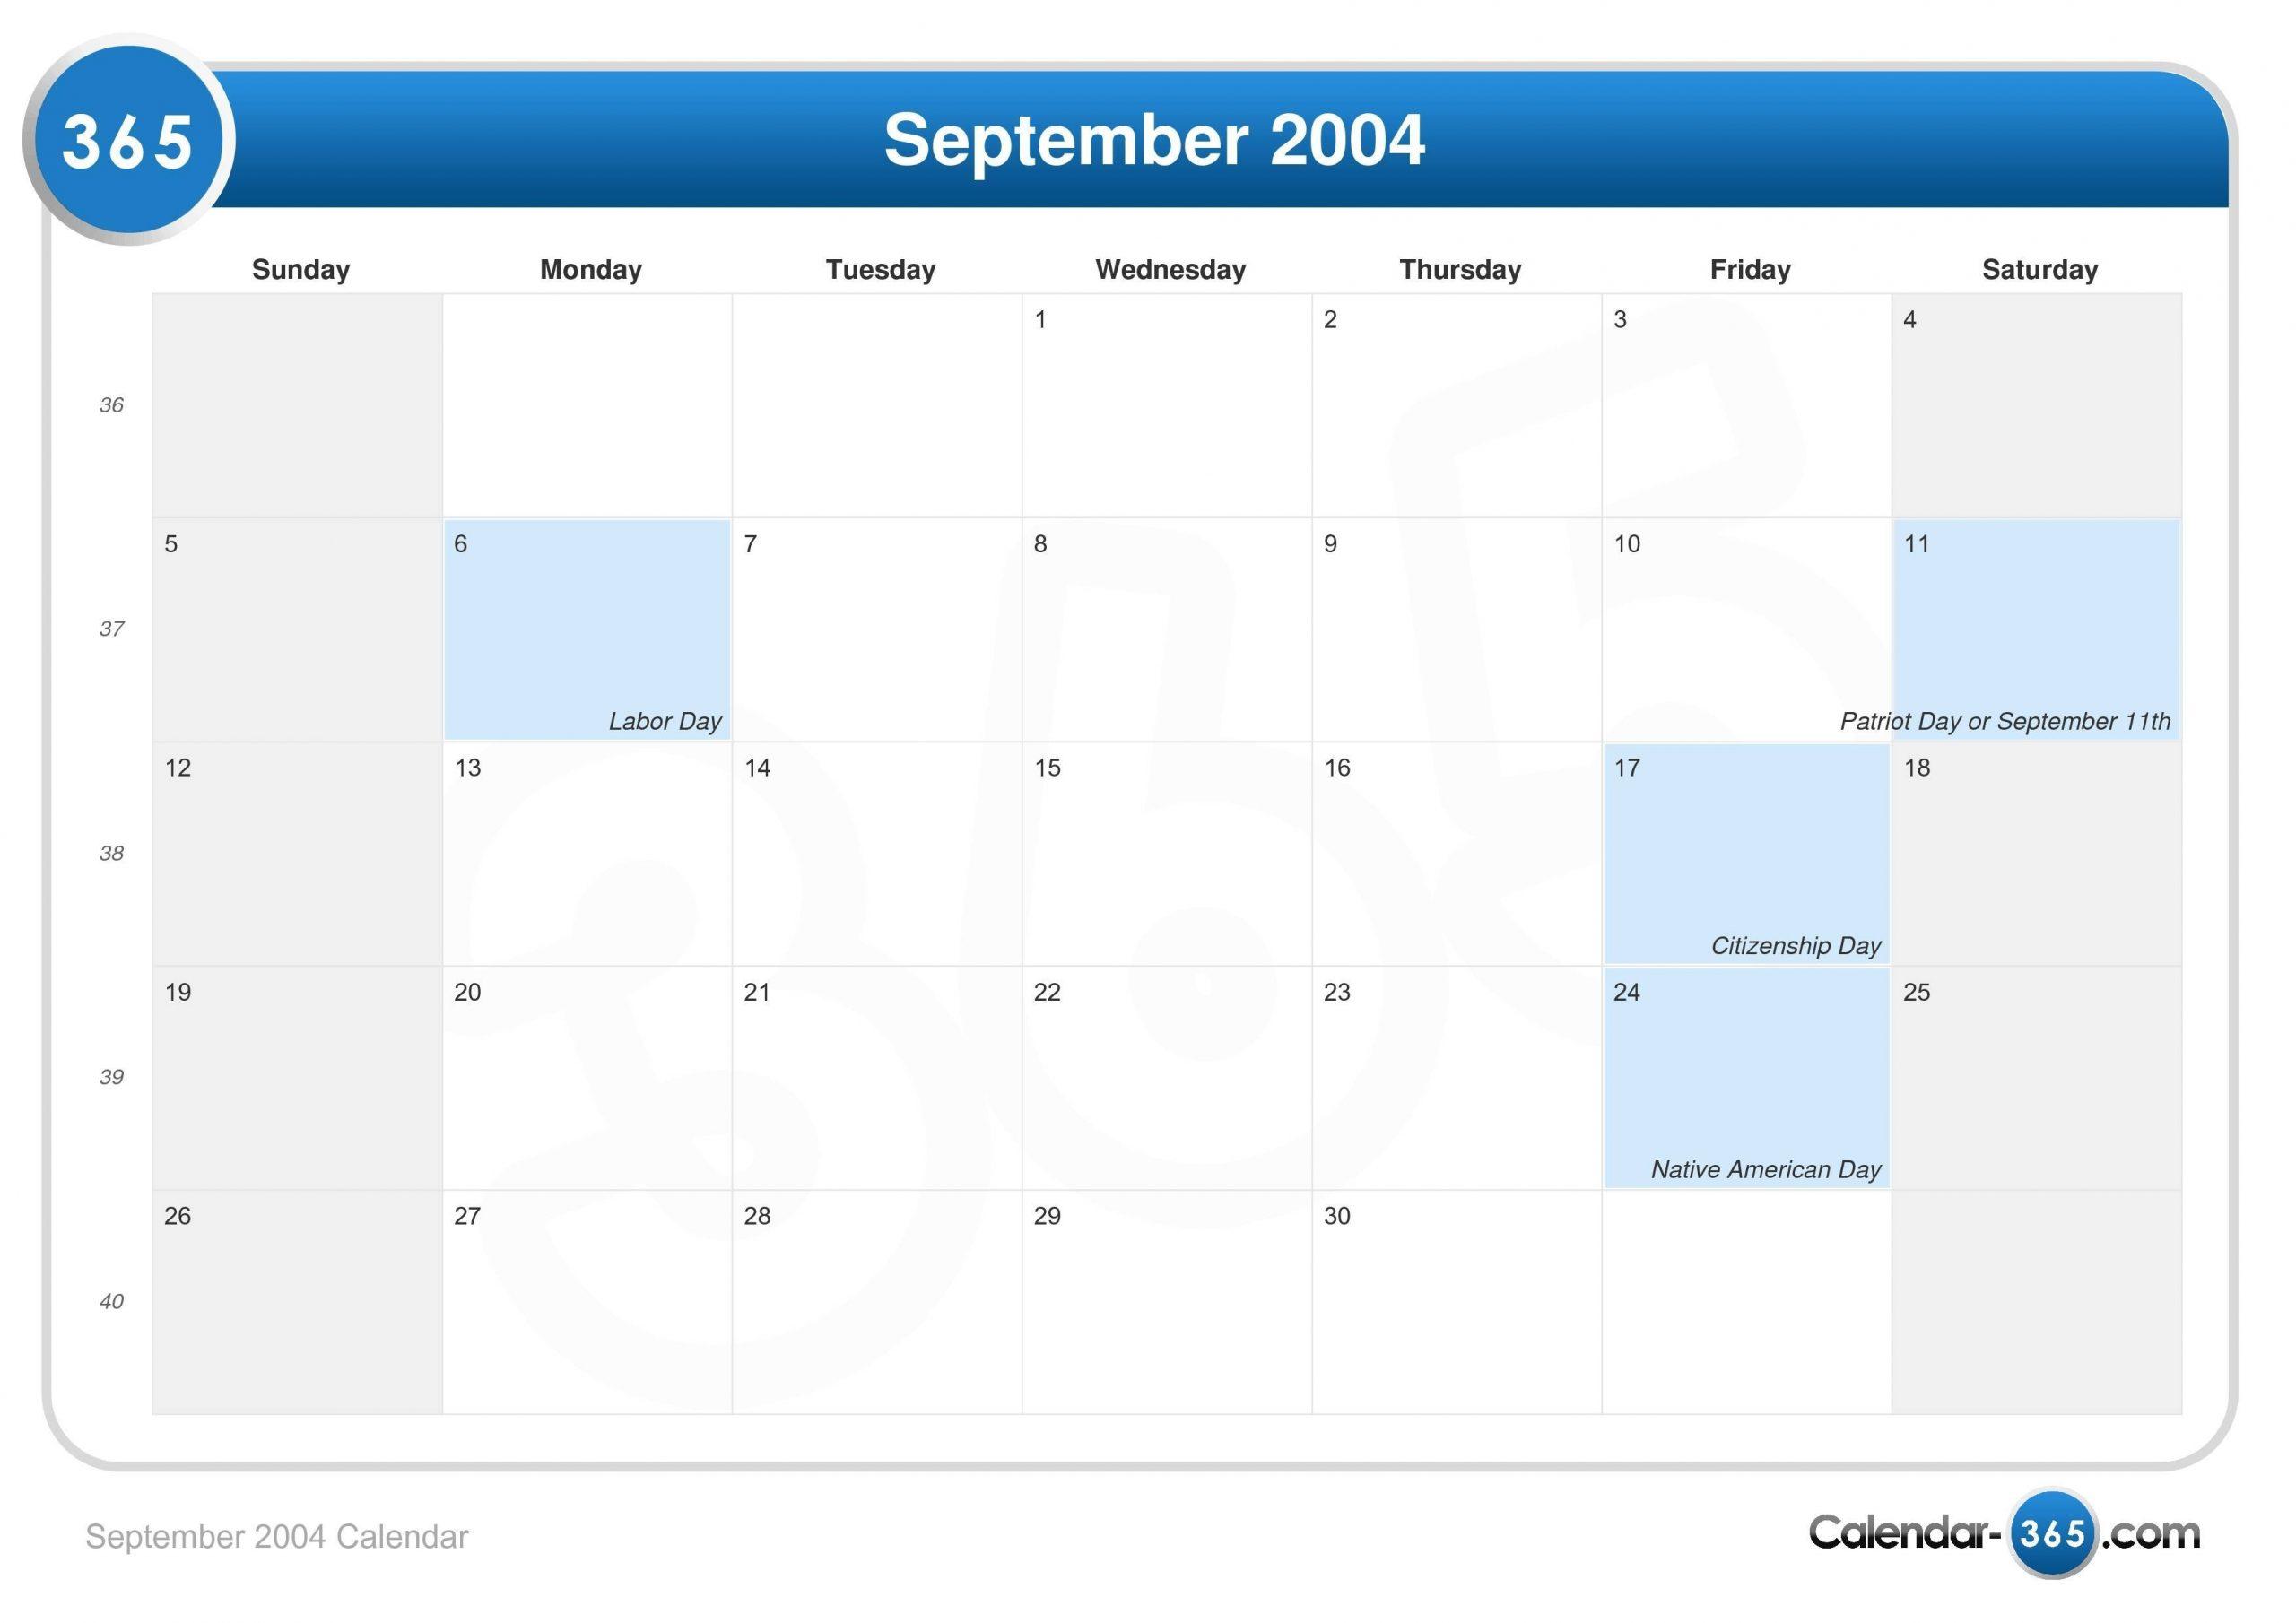 September 2004 Calendar